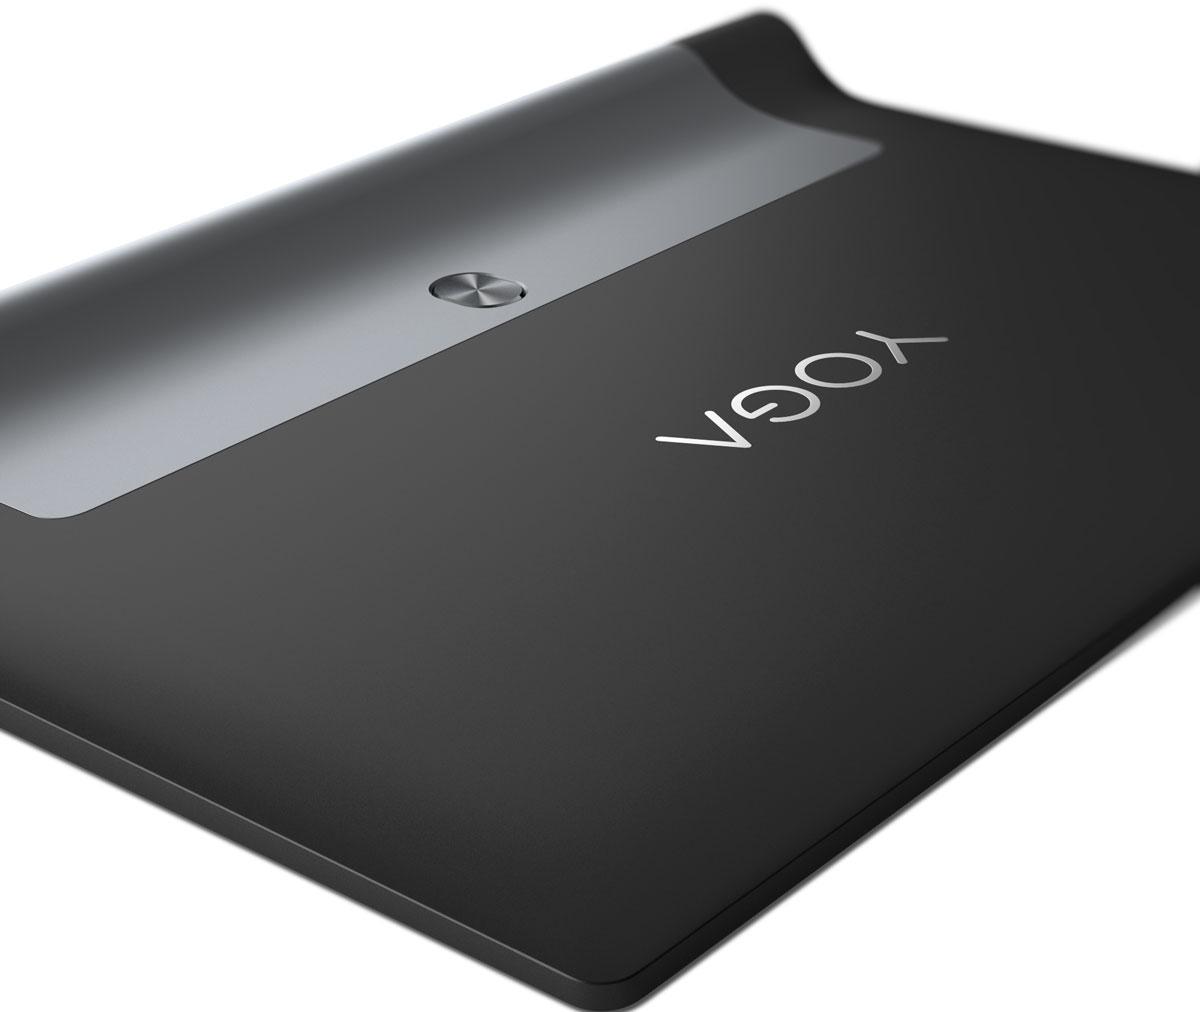 Lenovo Yoga Tab 3 10 (YT3-X50M), Black